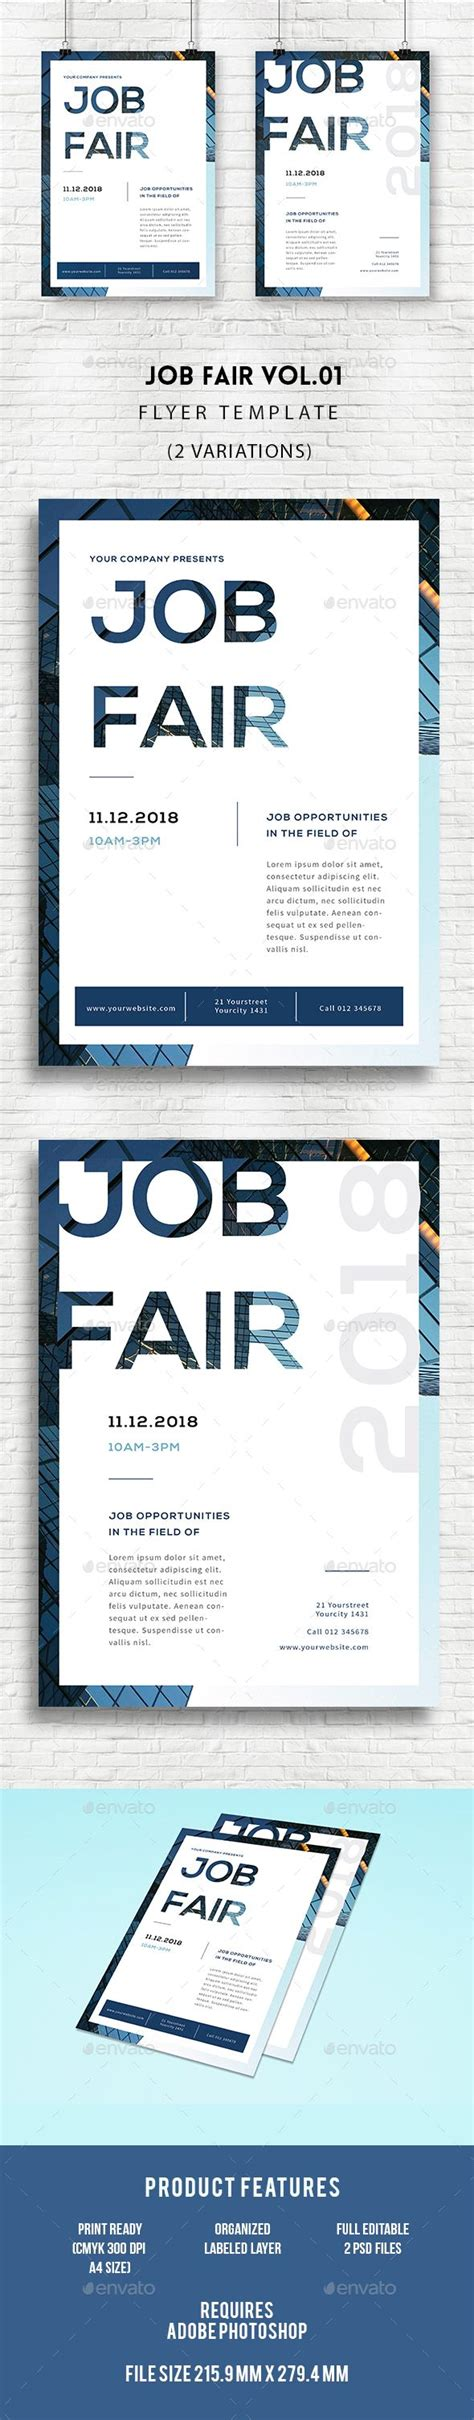 jobs layout design job fair flyer job fair psd templates and template